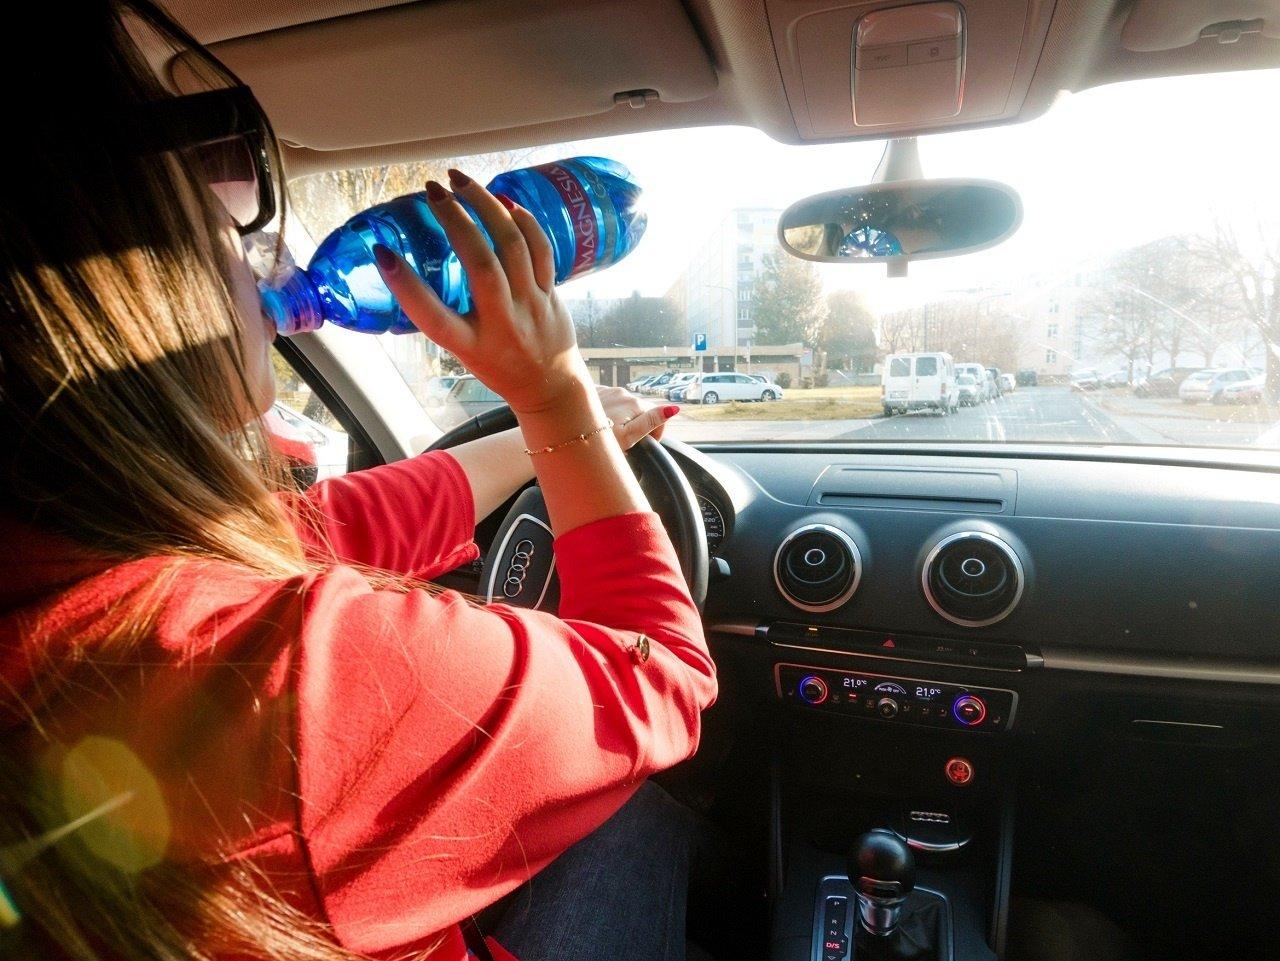 Pitný režim za volantom